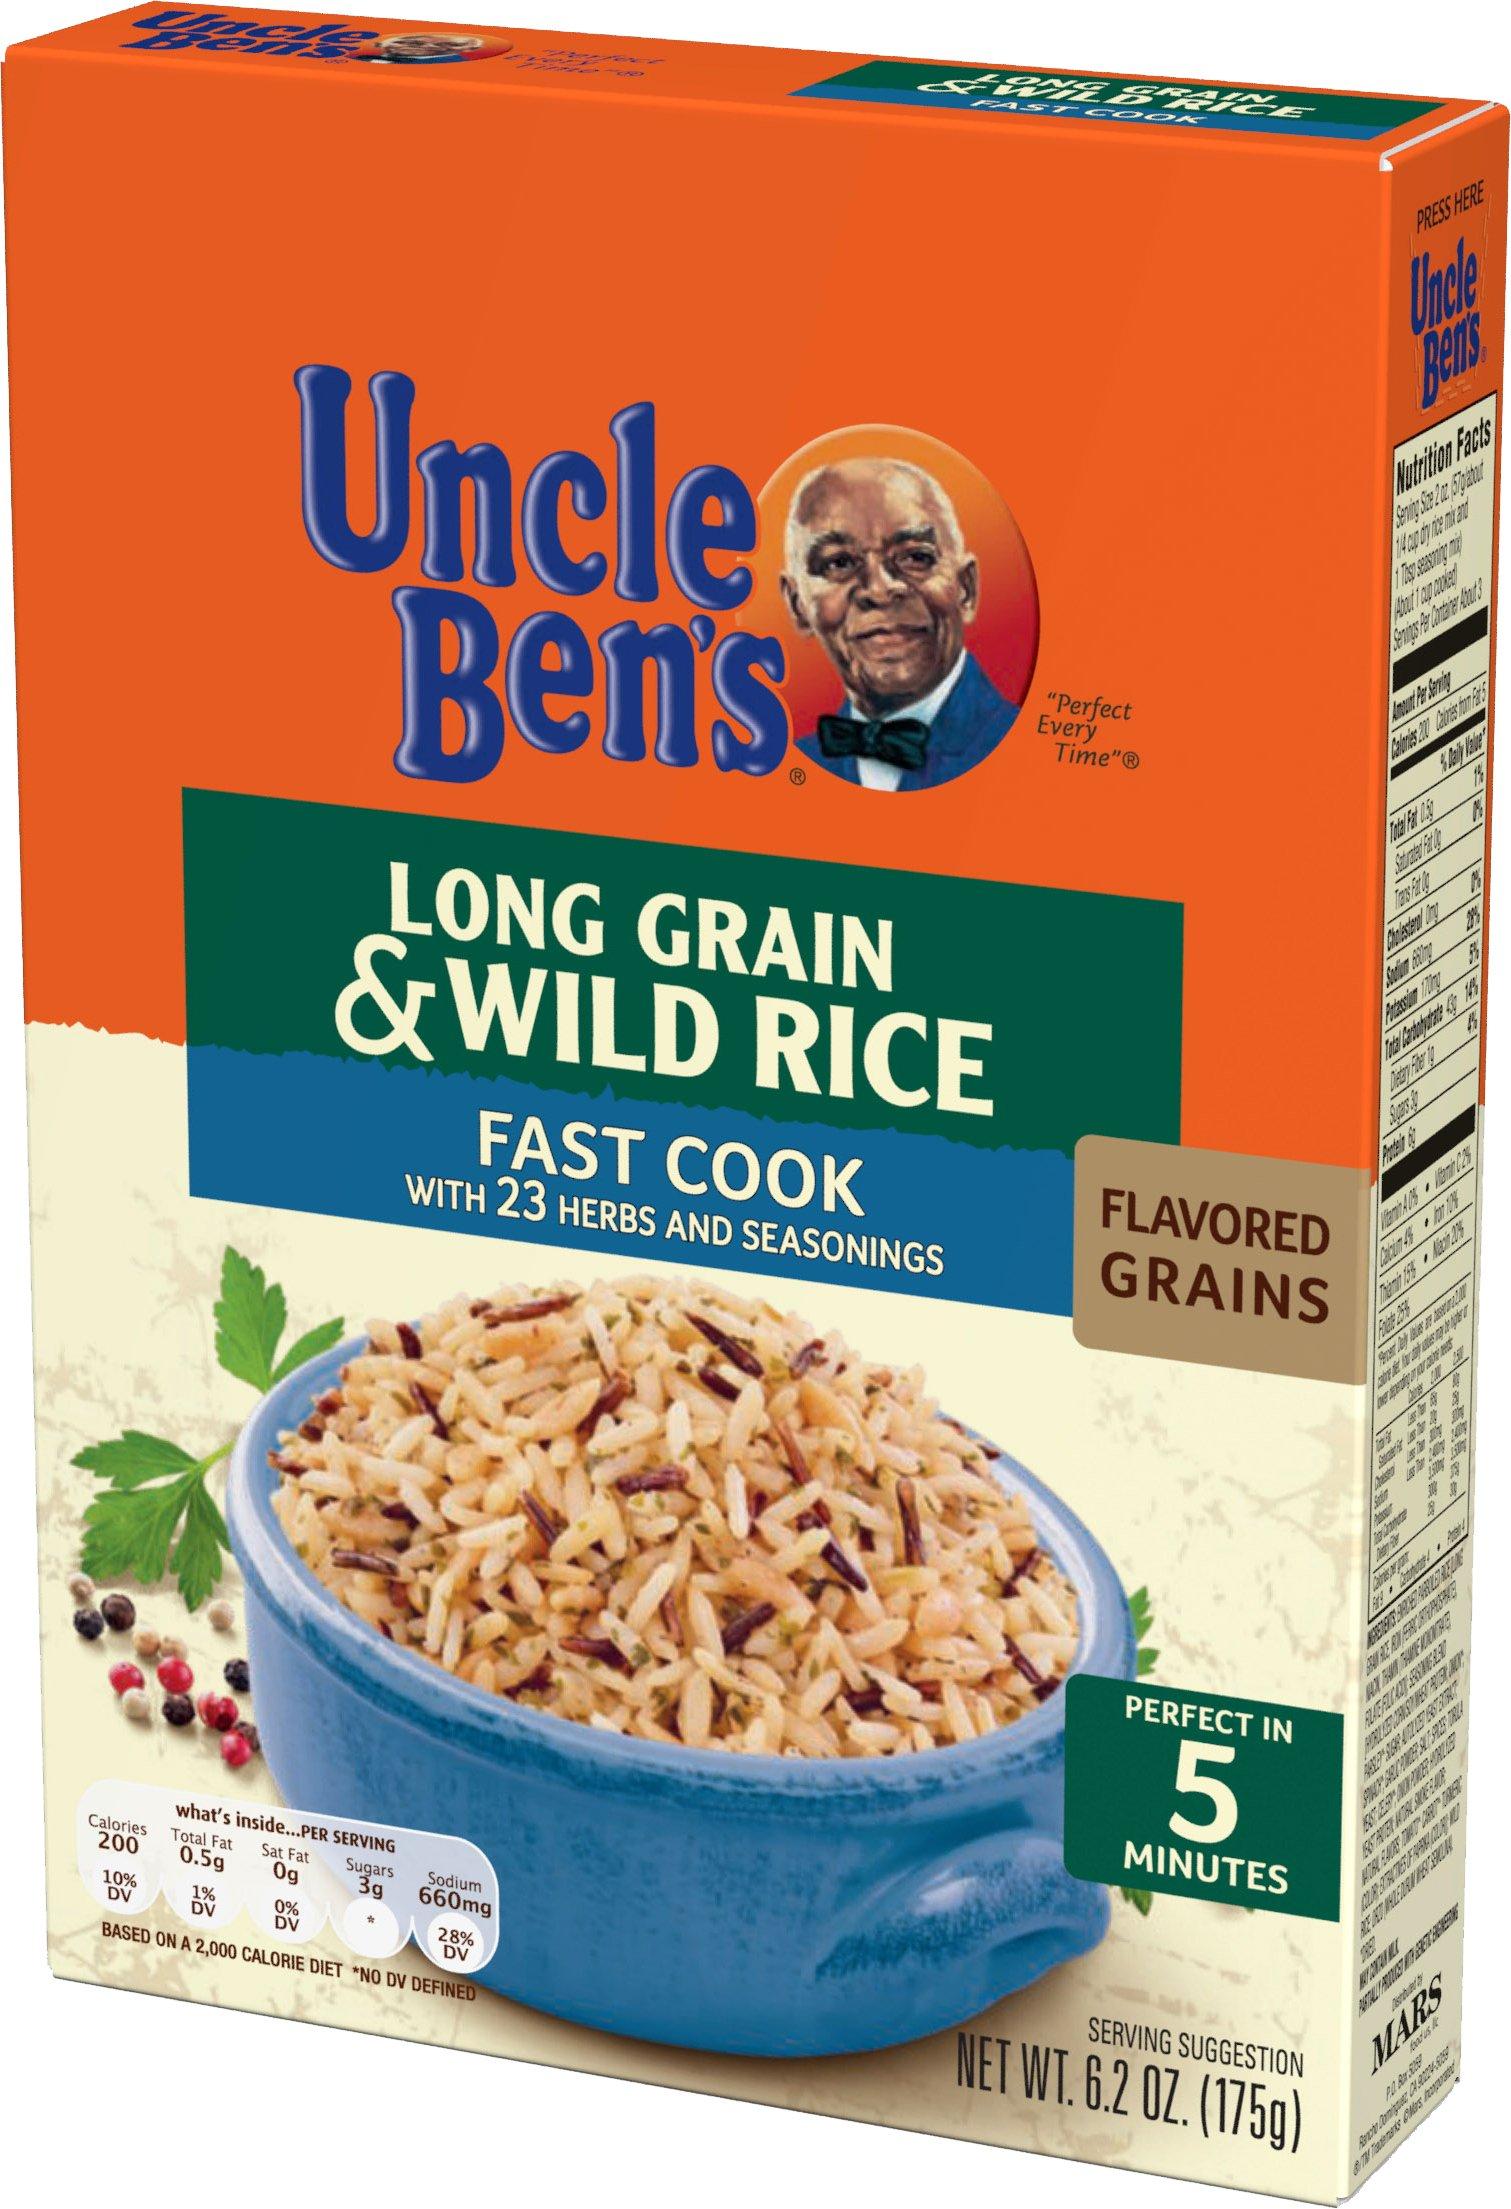 Amazon.com : Uncle Ben's Long Grain and Wild Rice Original